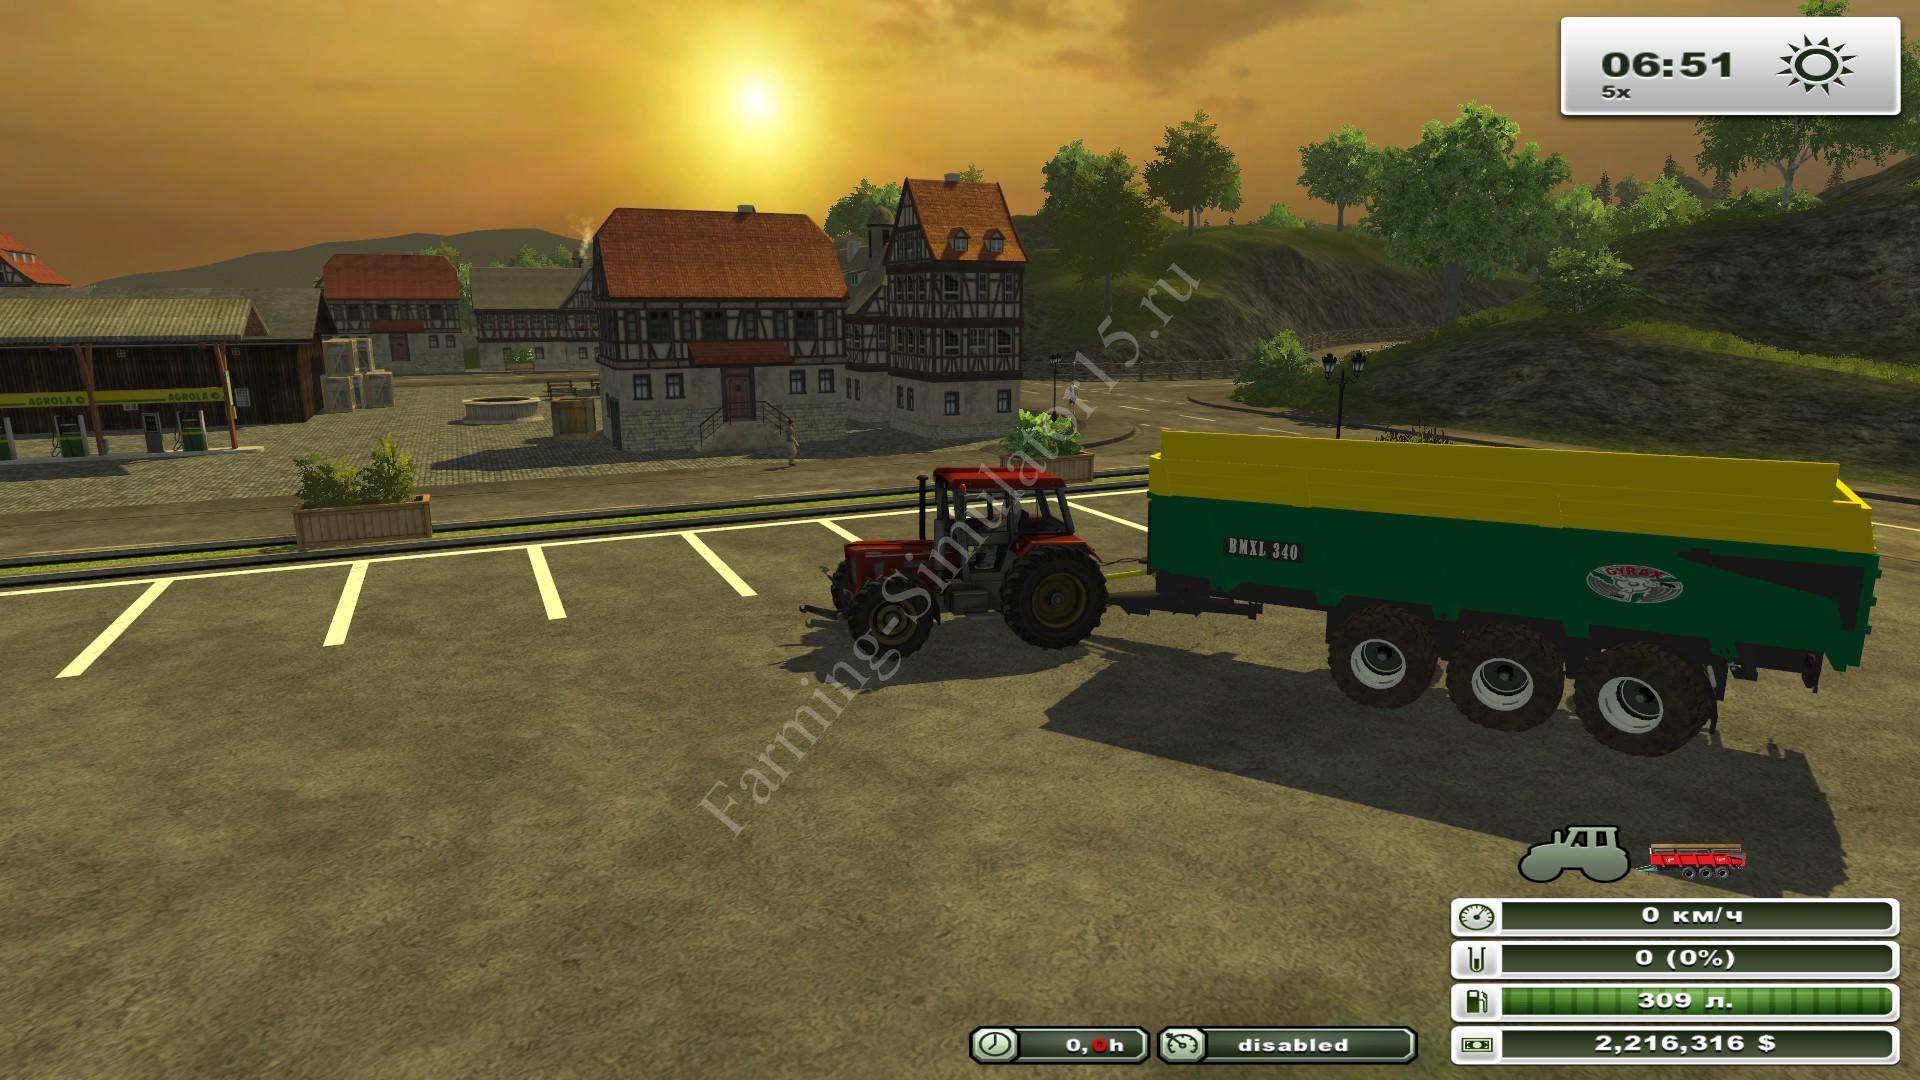 Benne Gyrax BMXL 340 DV v 1.0 - мод трехосного прицепа Farming Simulator 13, Farming Simulator 2013